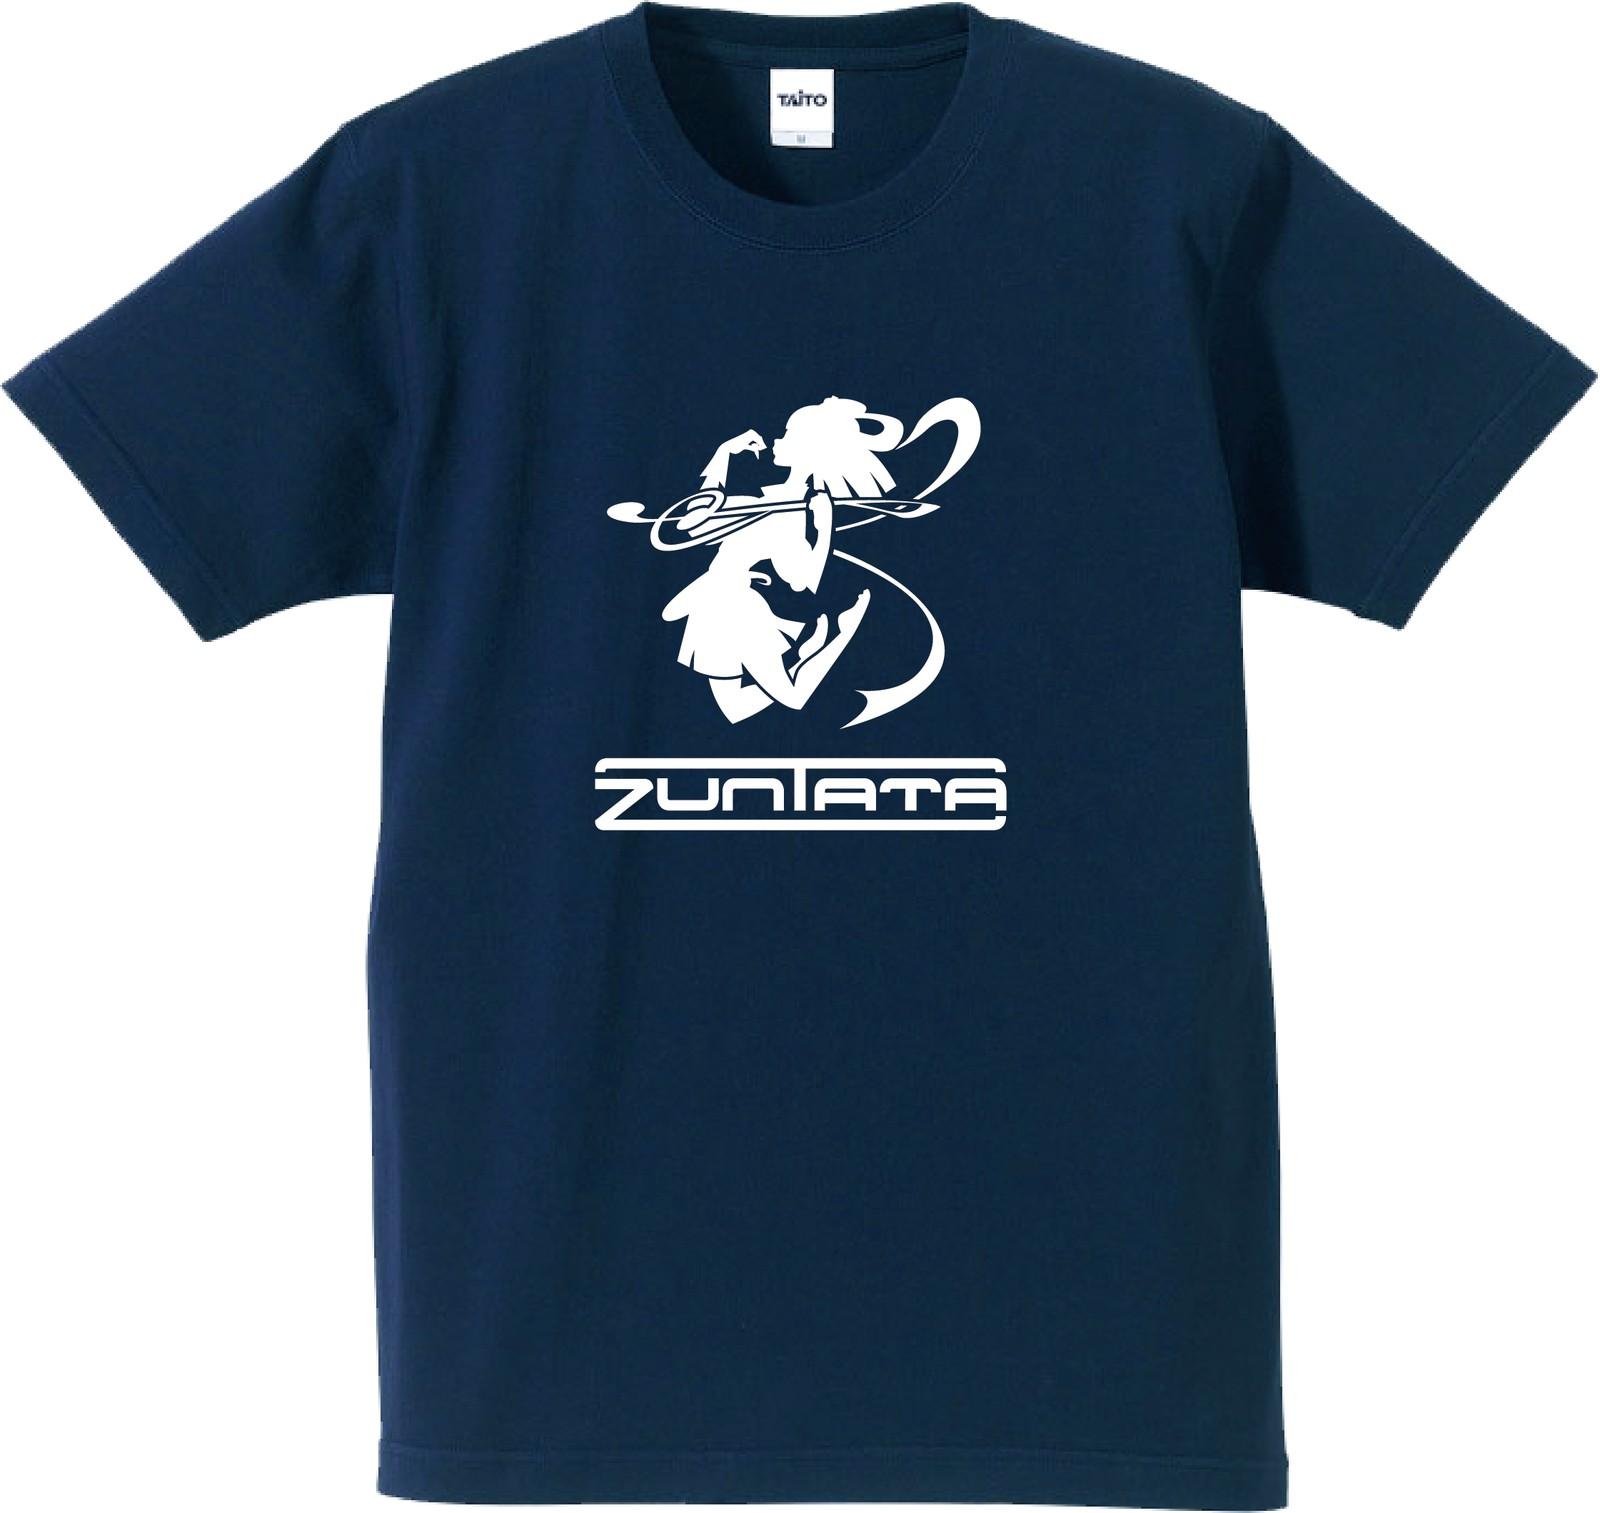 ZUNTATA ロゴ Tシャツ 4th ネイビー